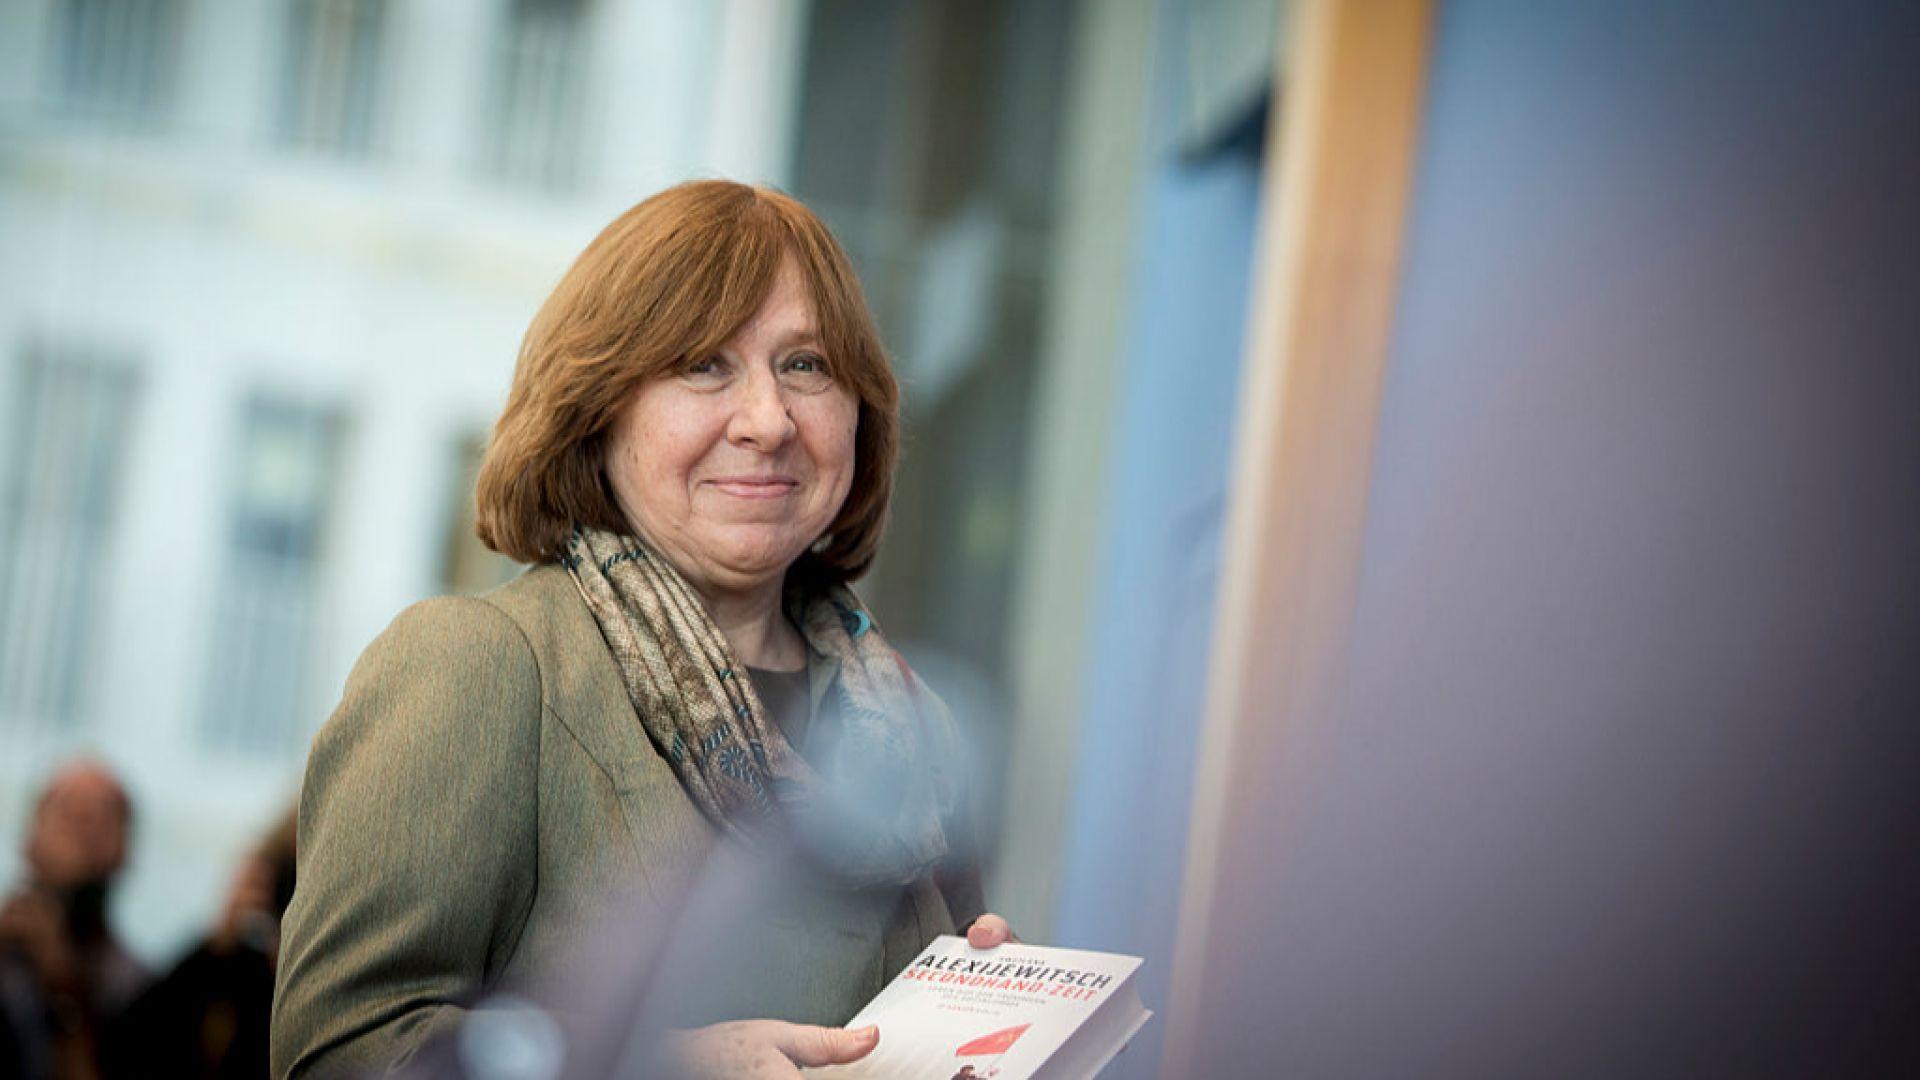 Нобеловата лауреатка за литература Светлана Алексиевич беше в Щутгарт за